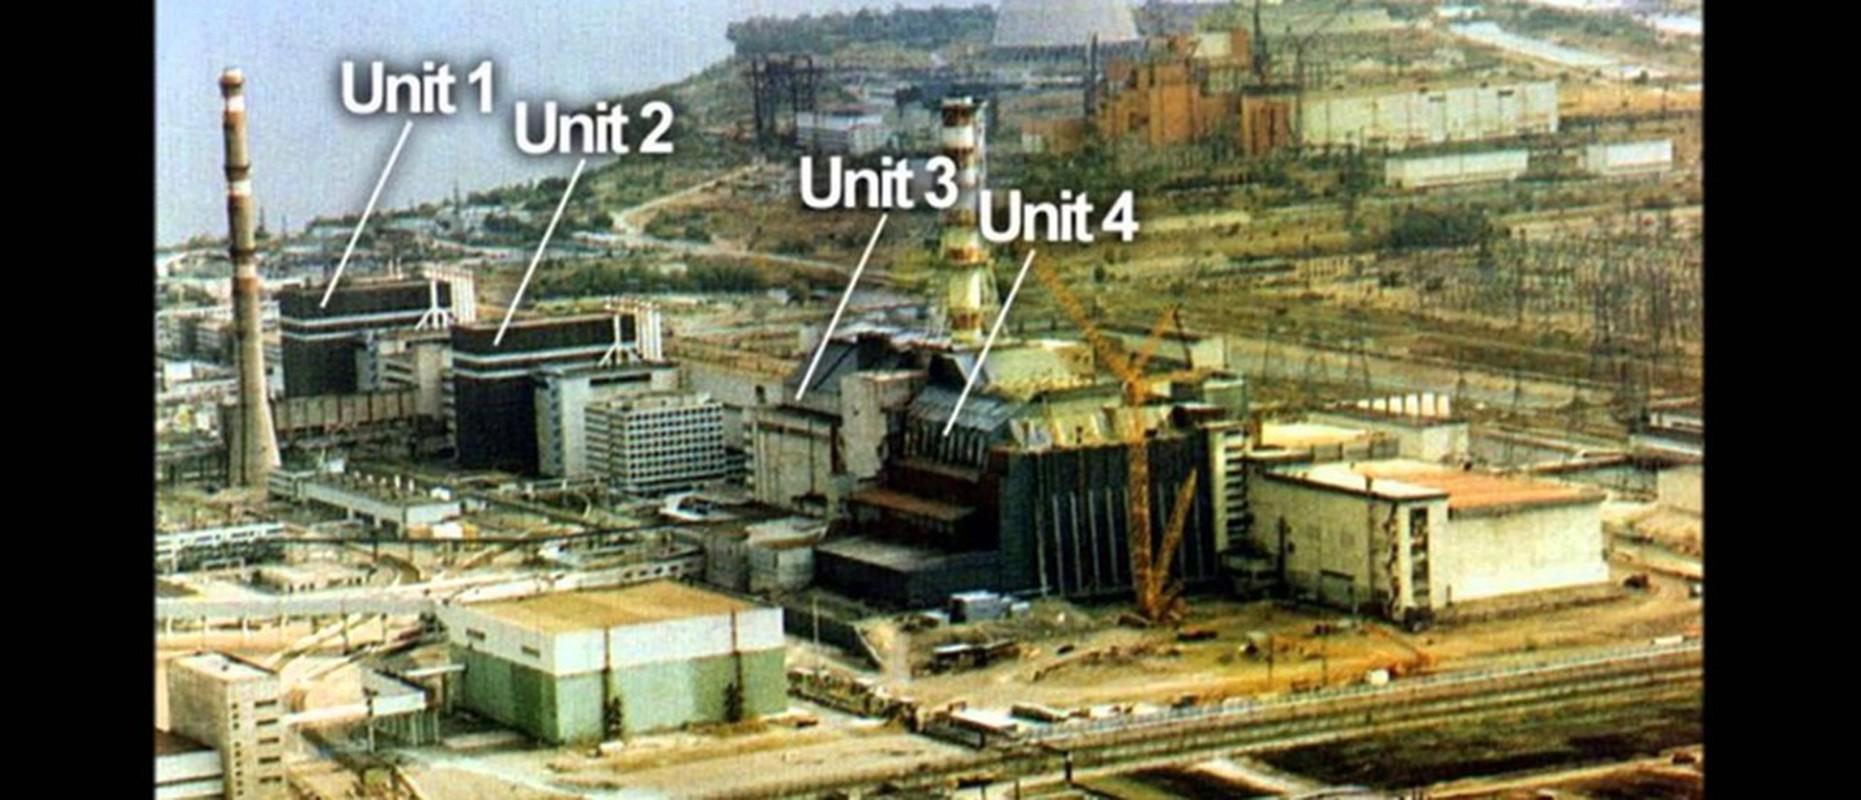 Nha may hat nhan Chernobyl co the phat no: Am anh tham hoa xua-Hinh-3